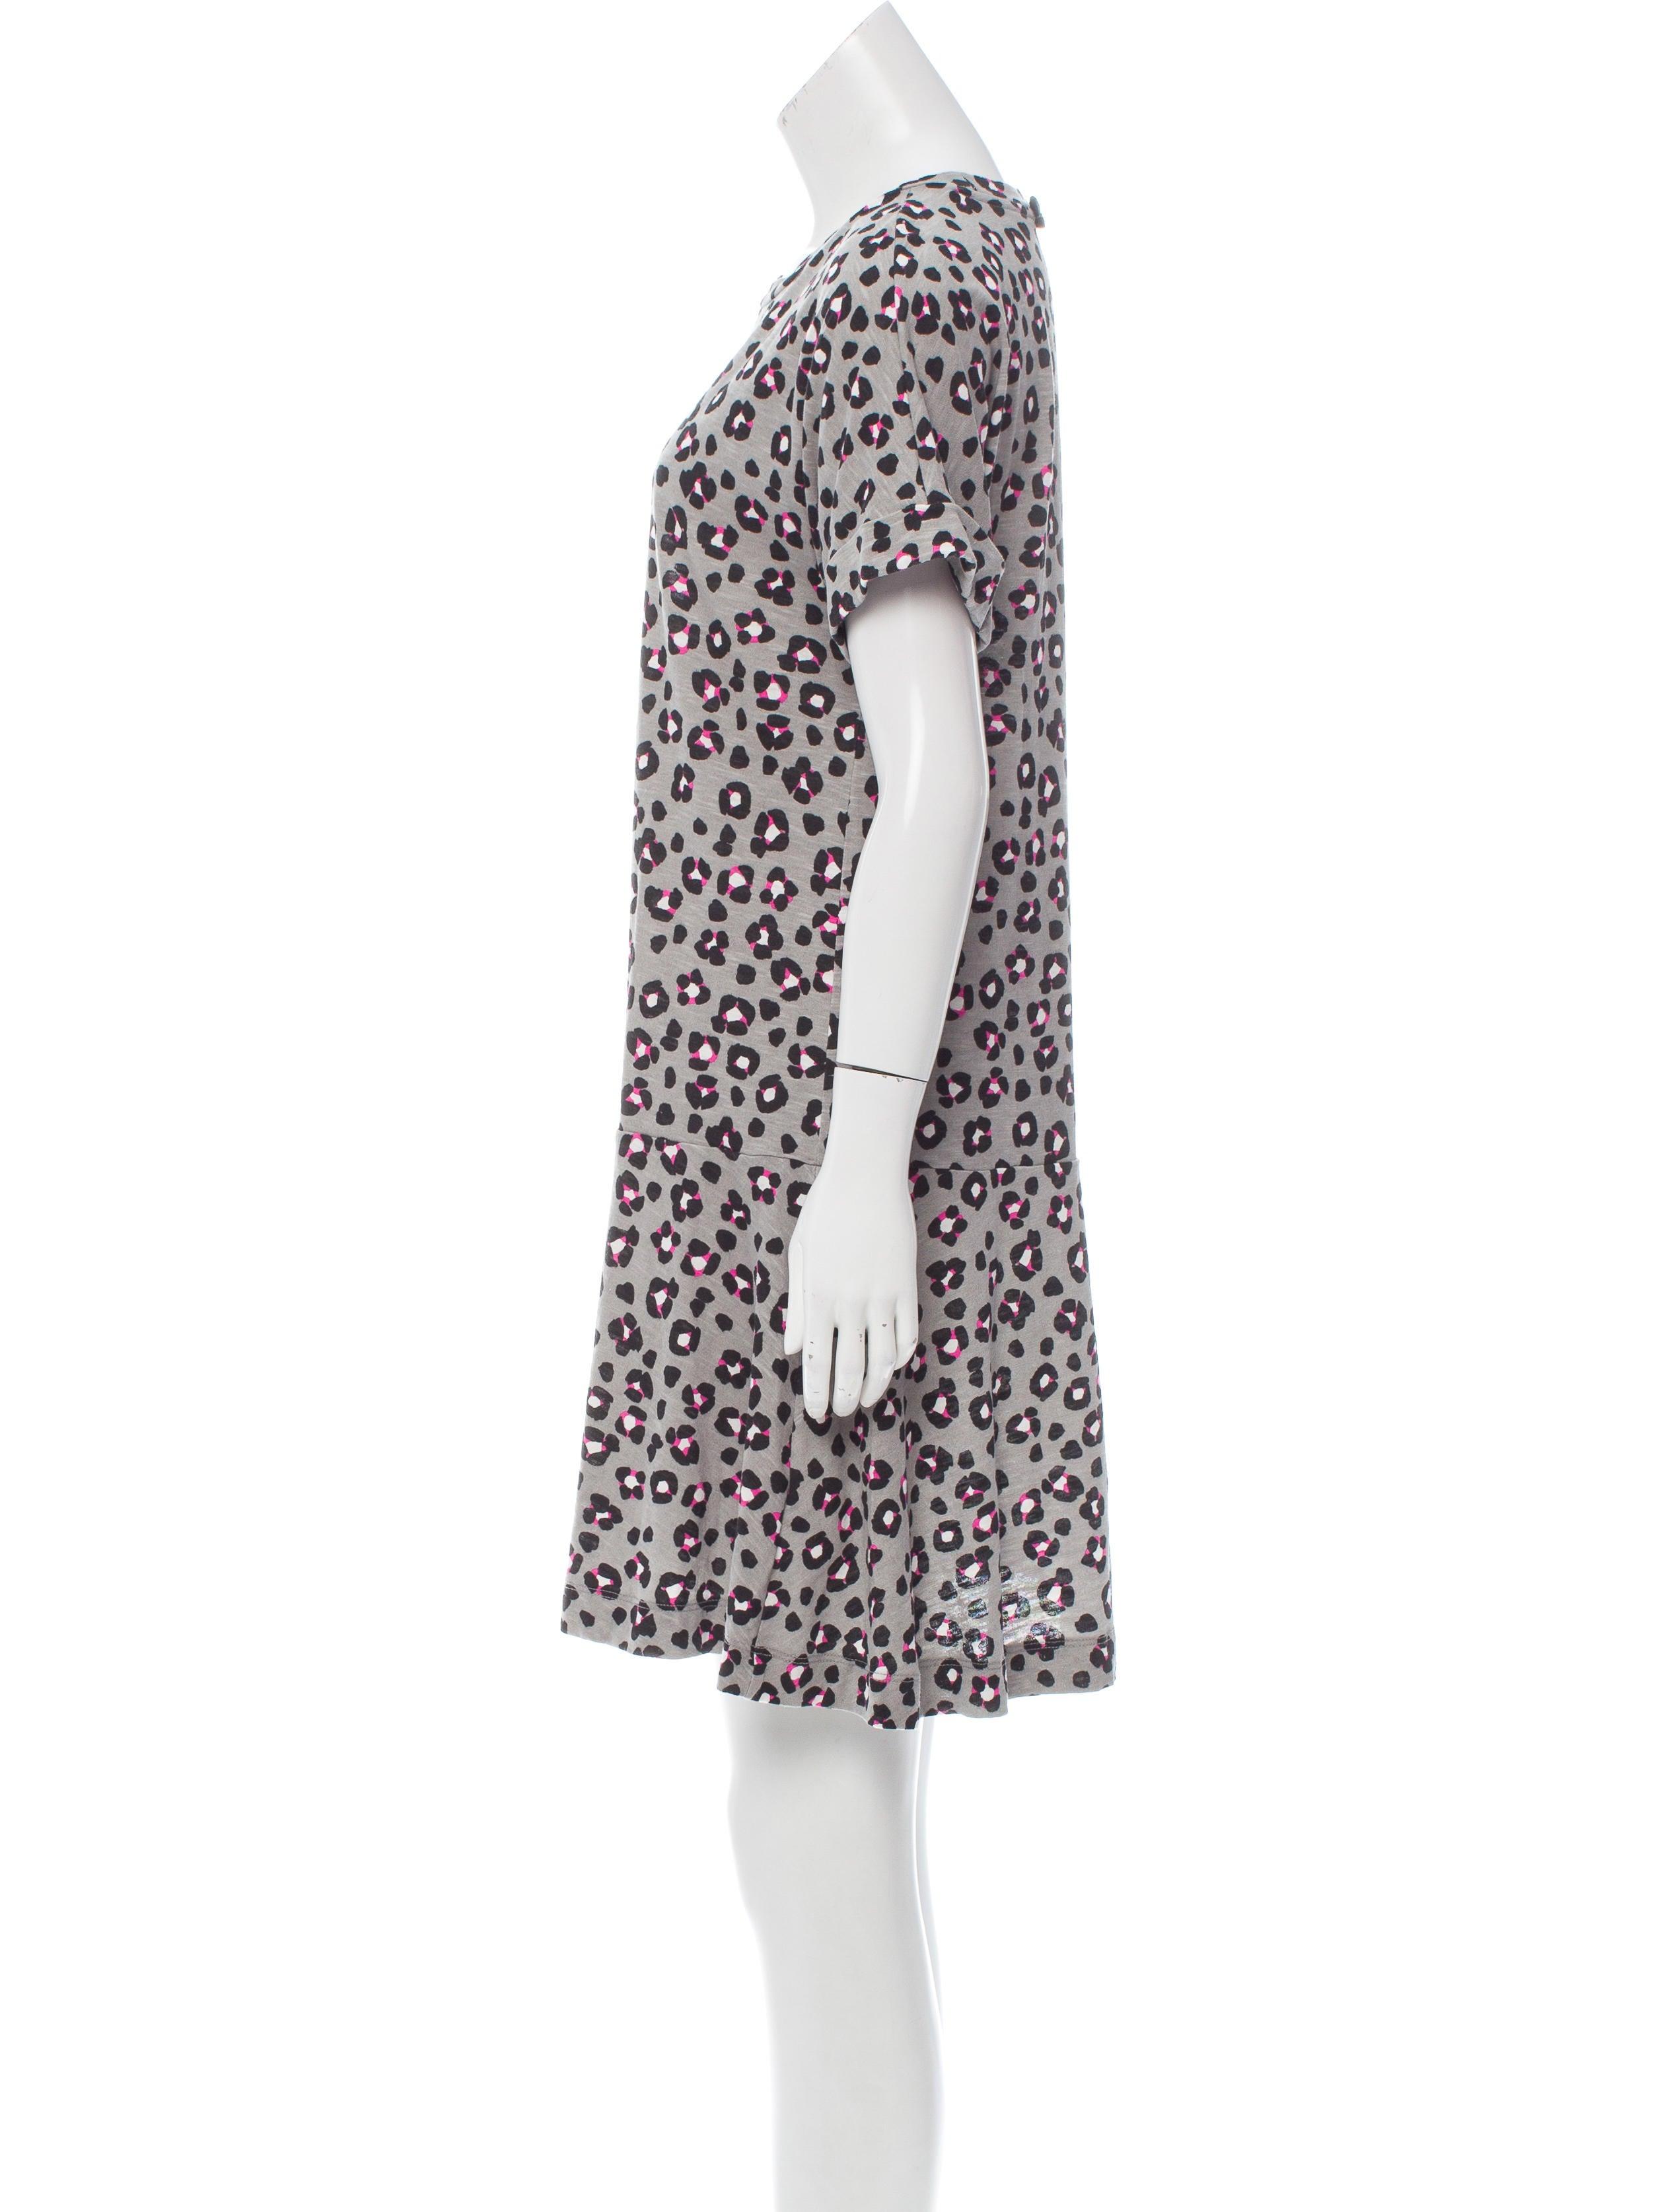 Kate Spade New York Leopard Intarsia Dress Clothing